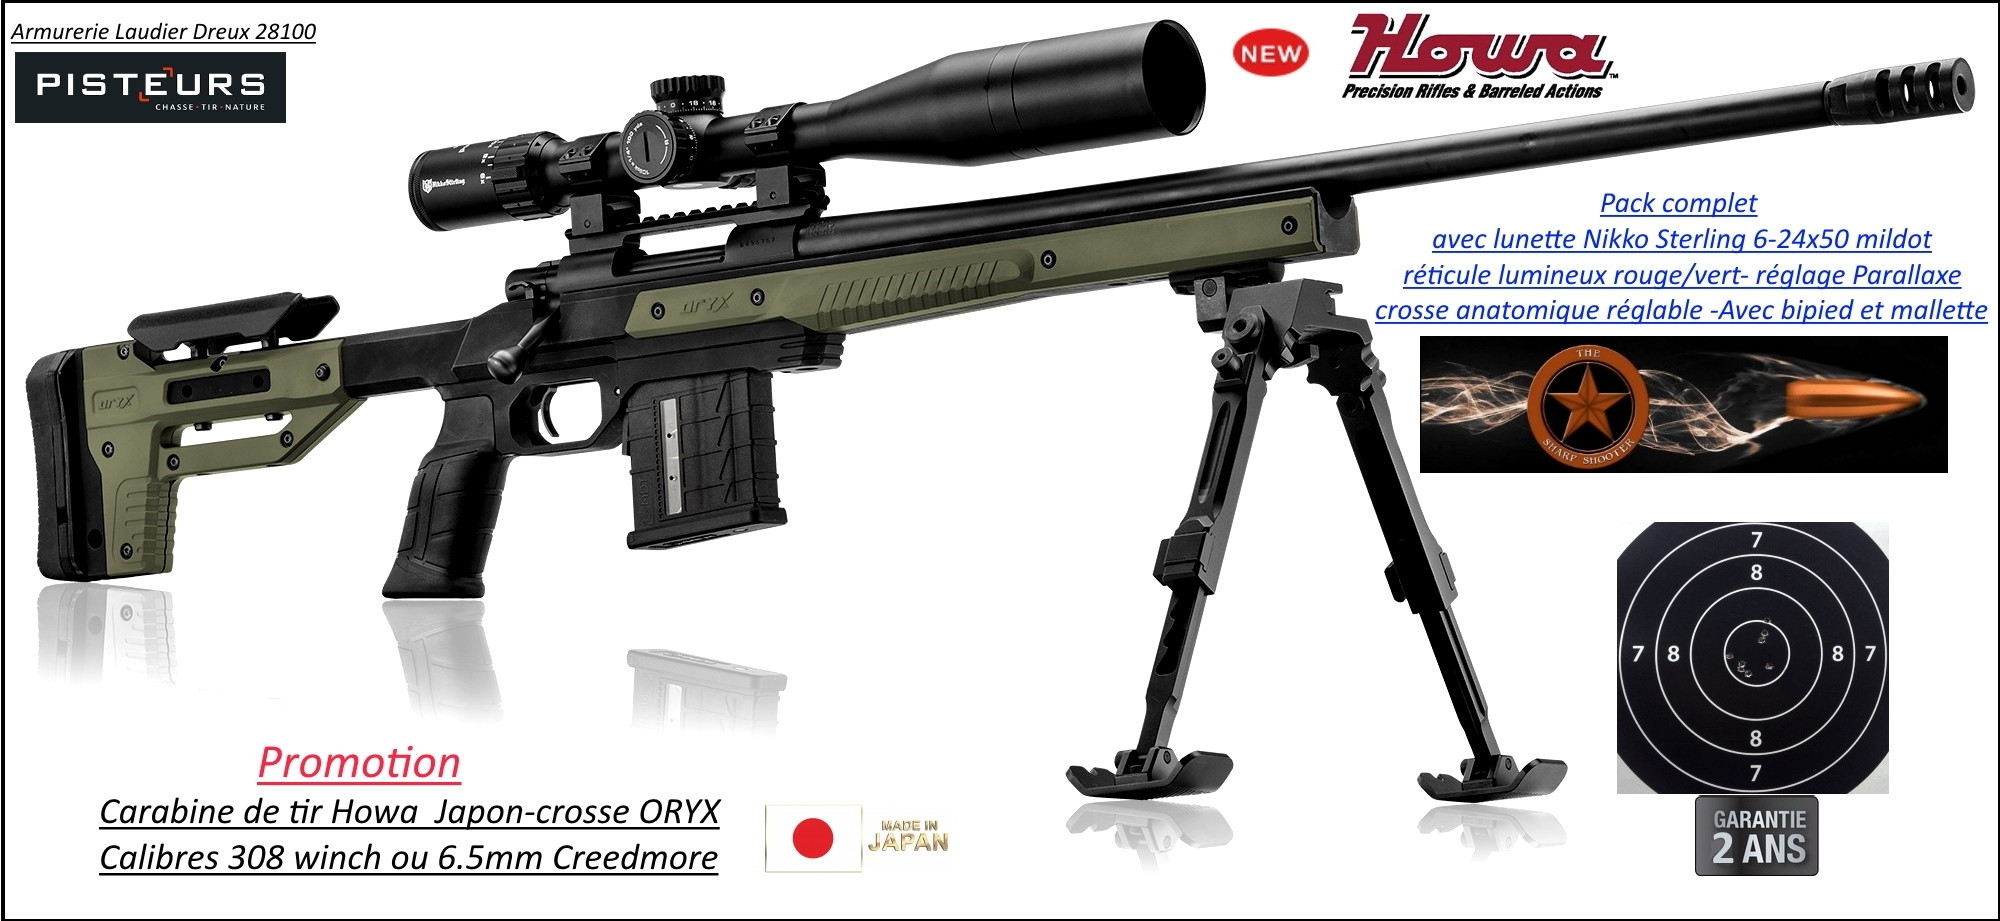 Carabines Howa Oryx SNIPER Calibres 308 Winch ou  6,5 Credmoor-Répétition Crosse réglable rails picatini +lunette Nikko-Sterling-6-24x50+Frein bouche+bipied-Promotion